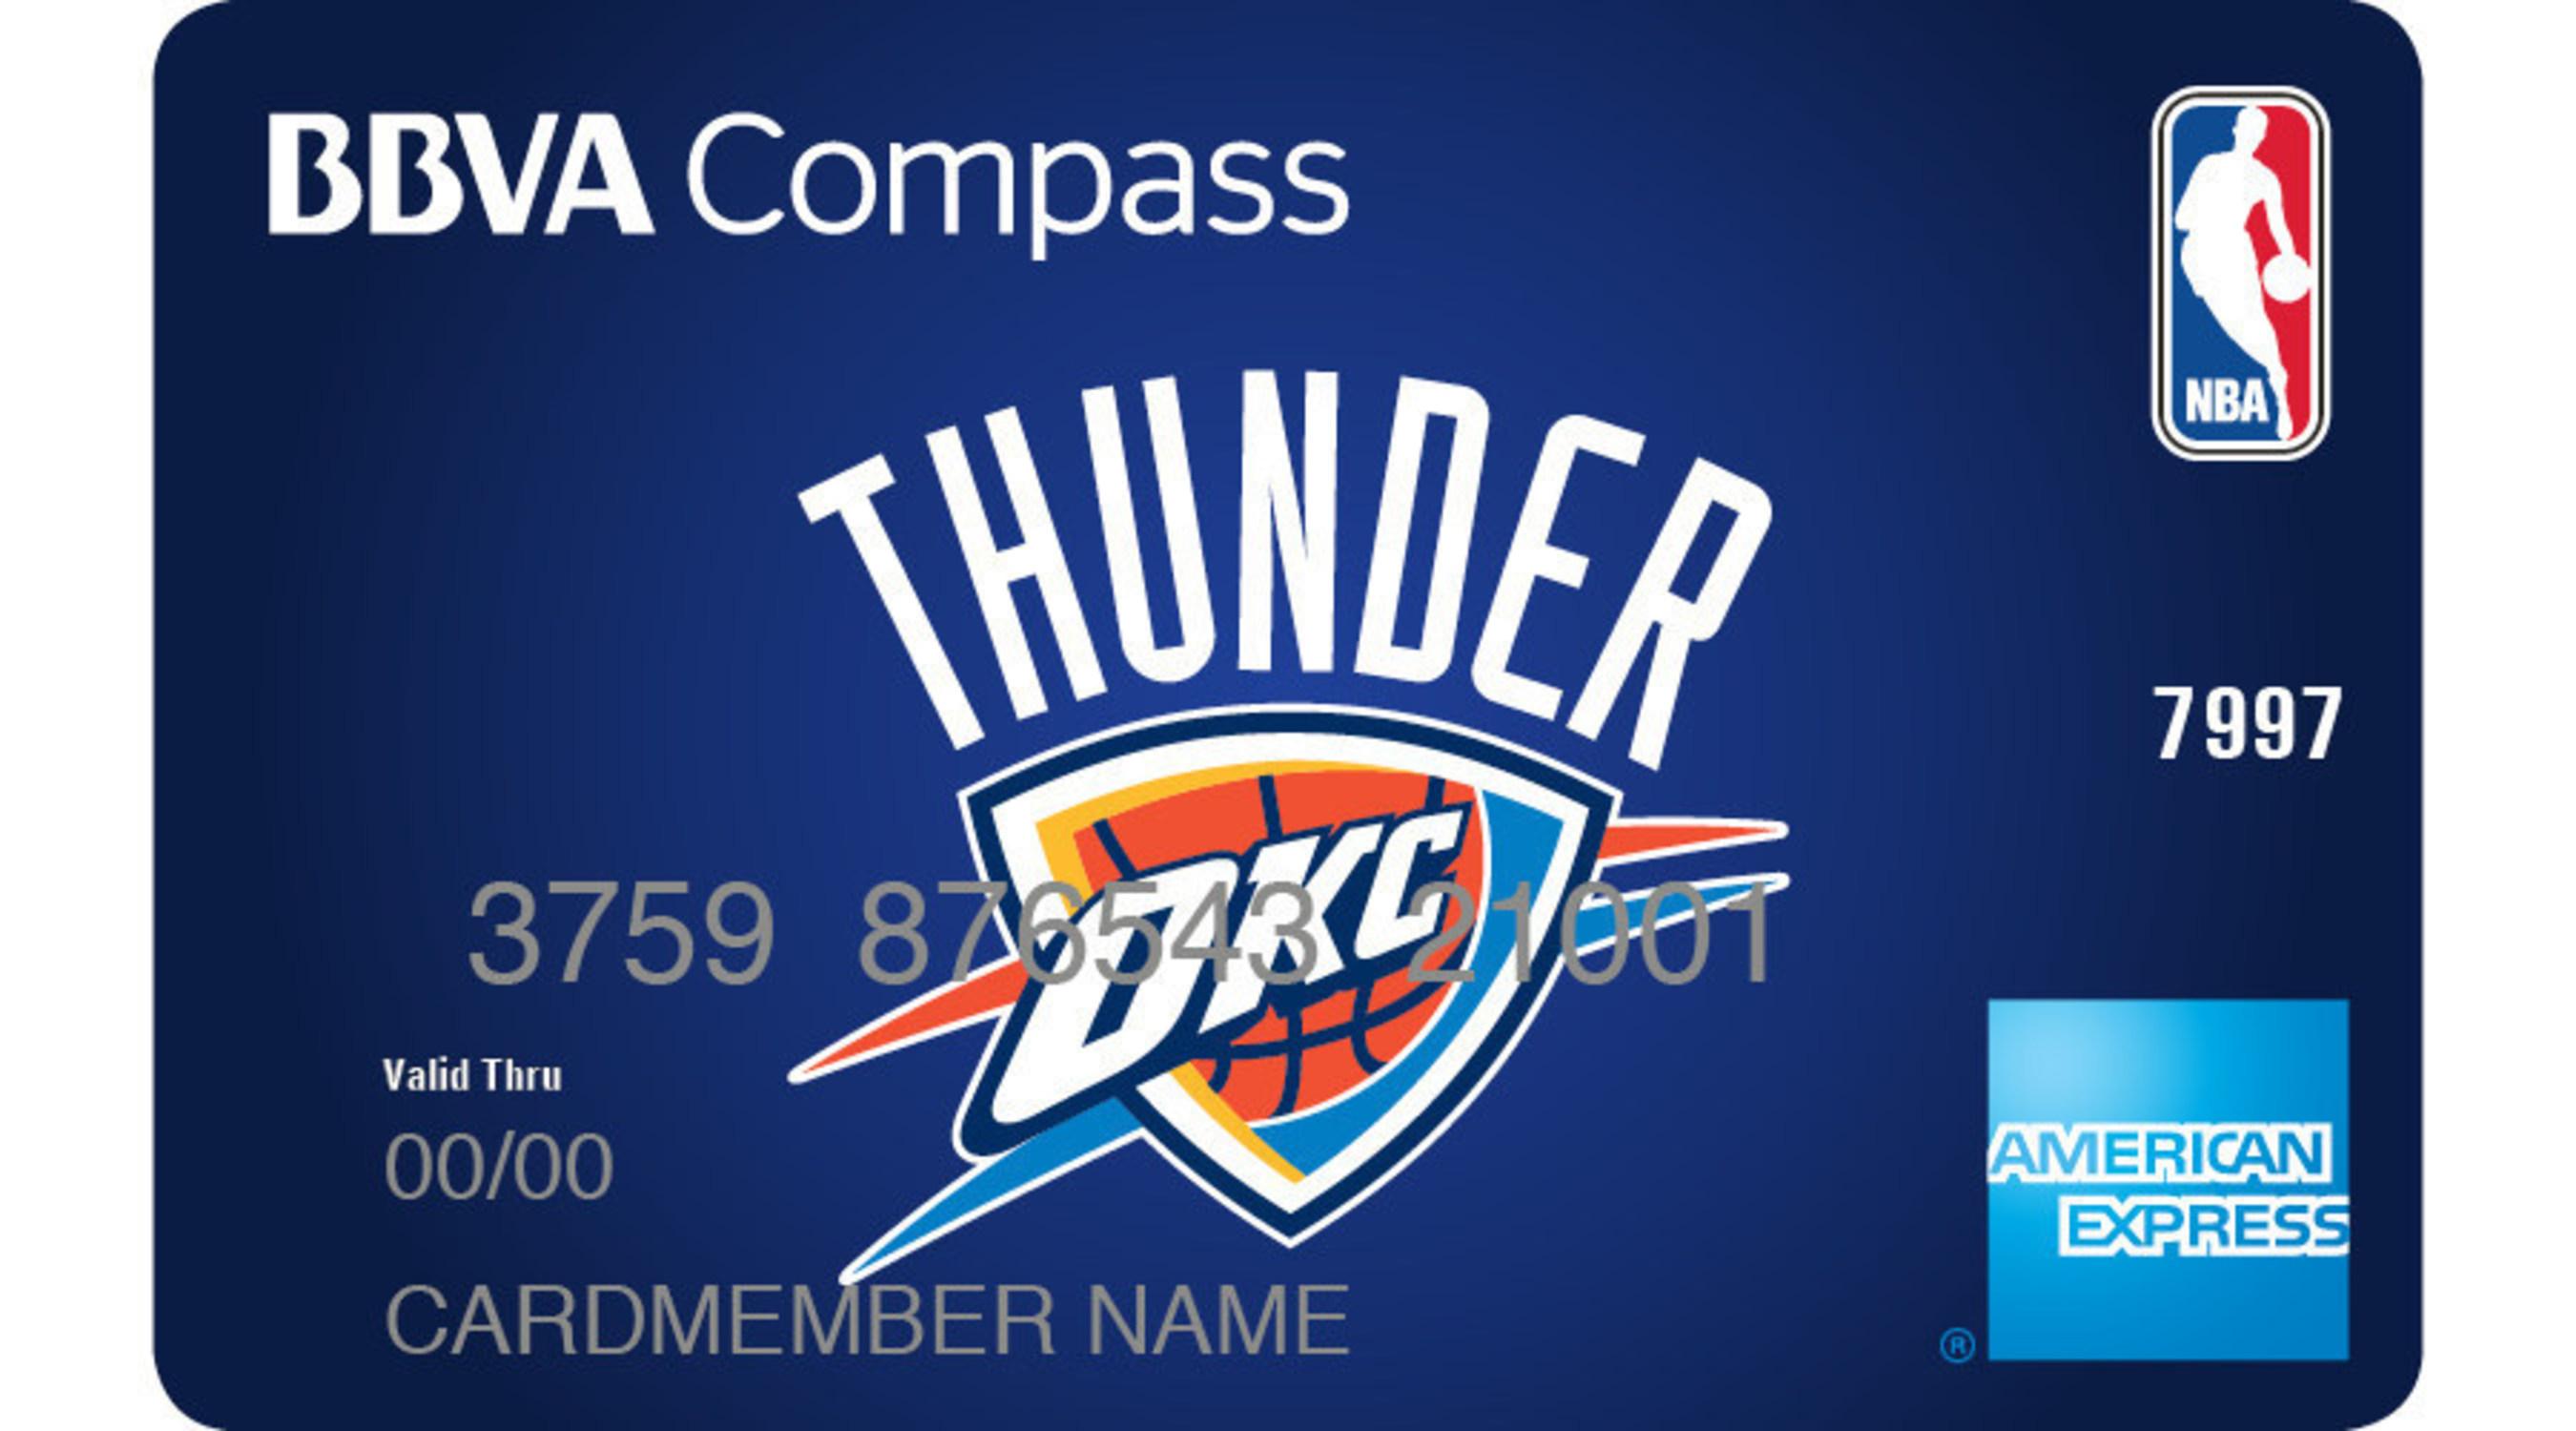 The BBVA Compass NBA American Express Card Featuring Oklahoma City Thunder Team Logo